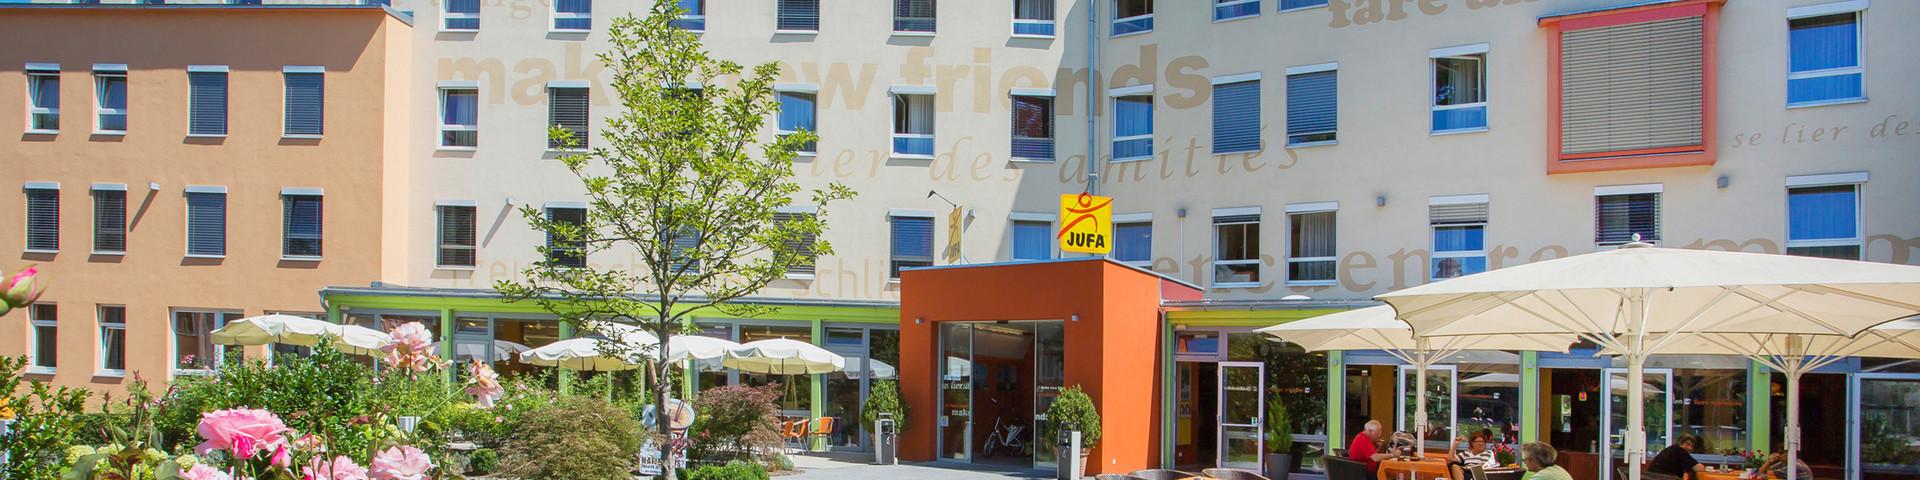 JUFA Hotel Salzburg City - Aussenansicht © JUFA Hotels